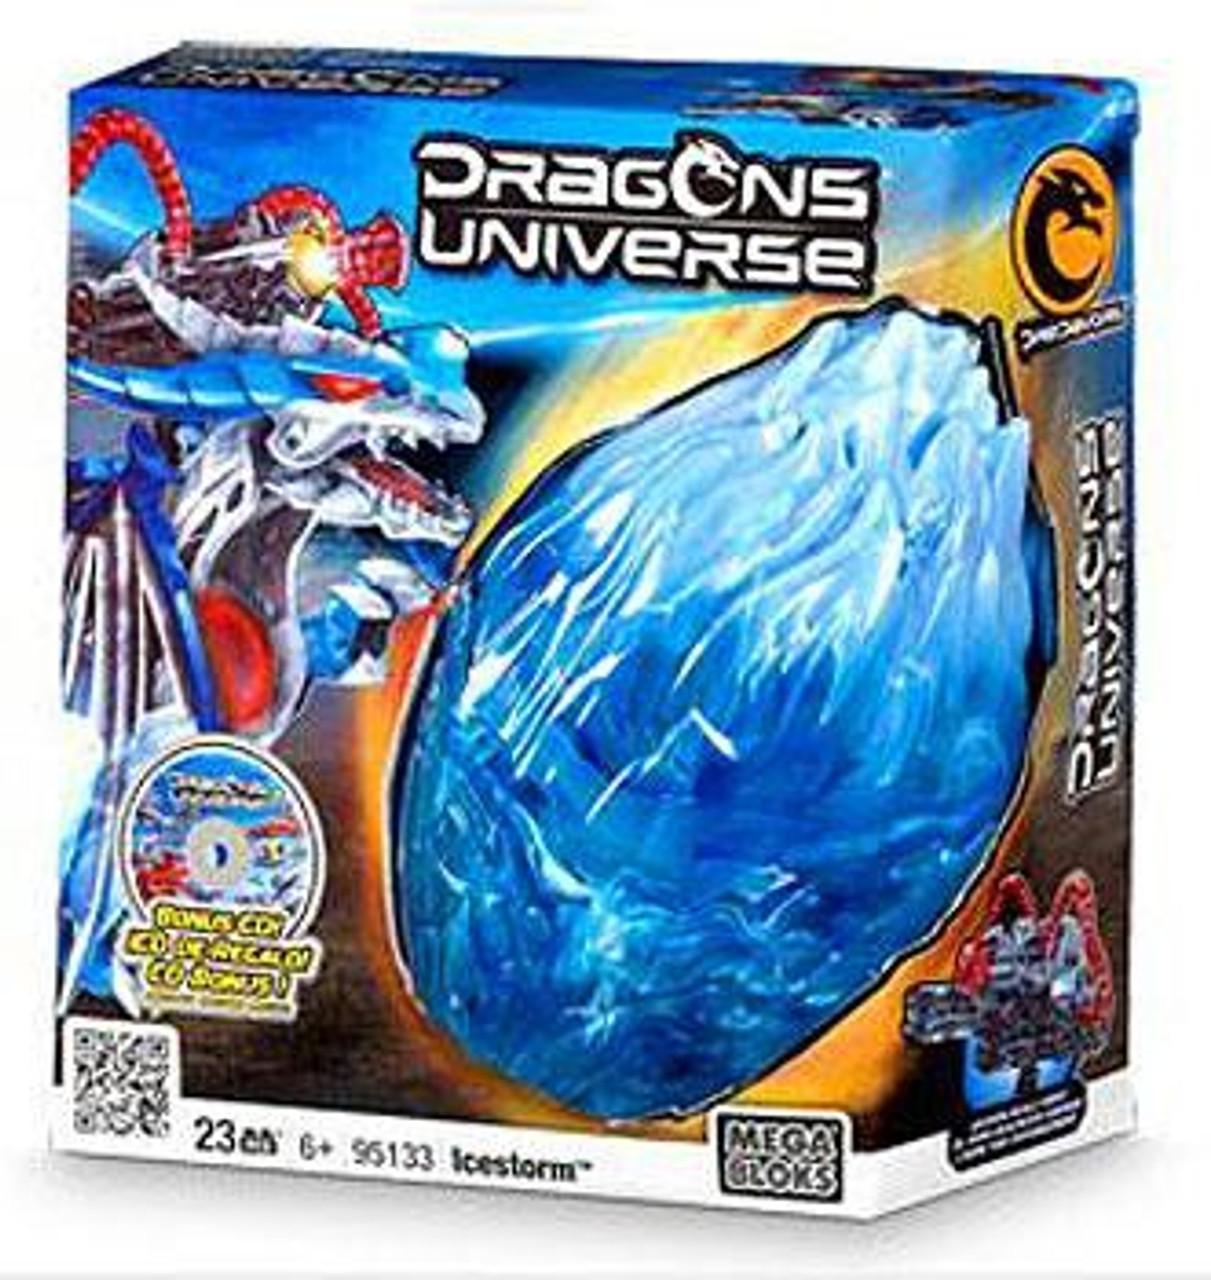 Mega Bloks Dragons Universe Icestorm Set #95133